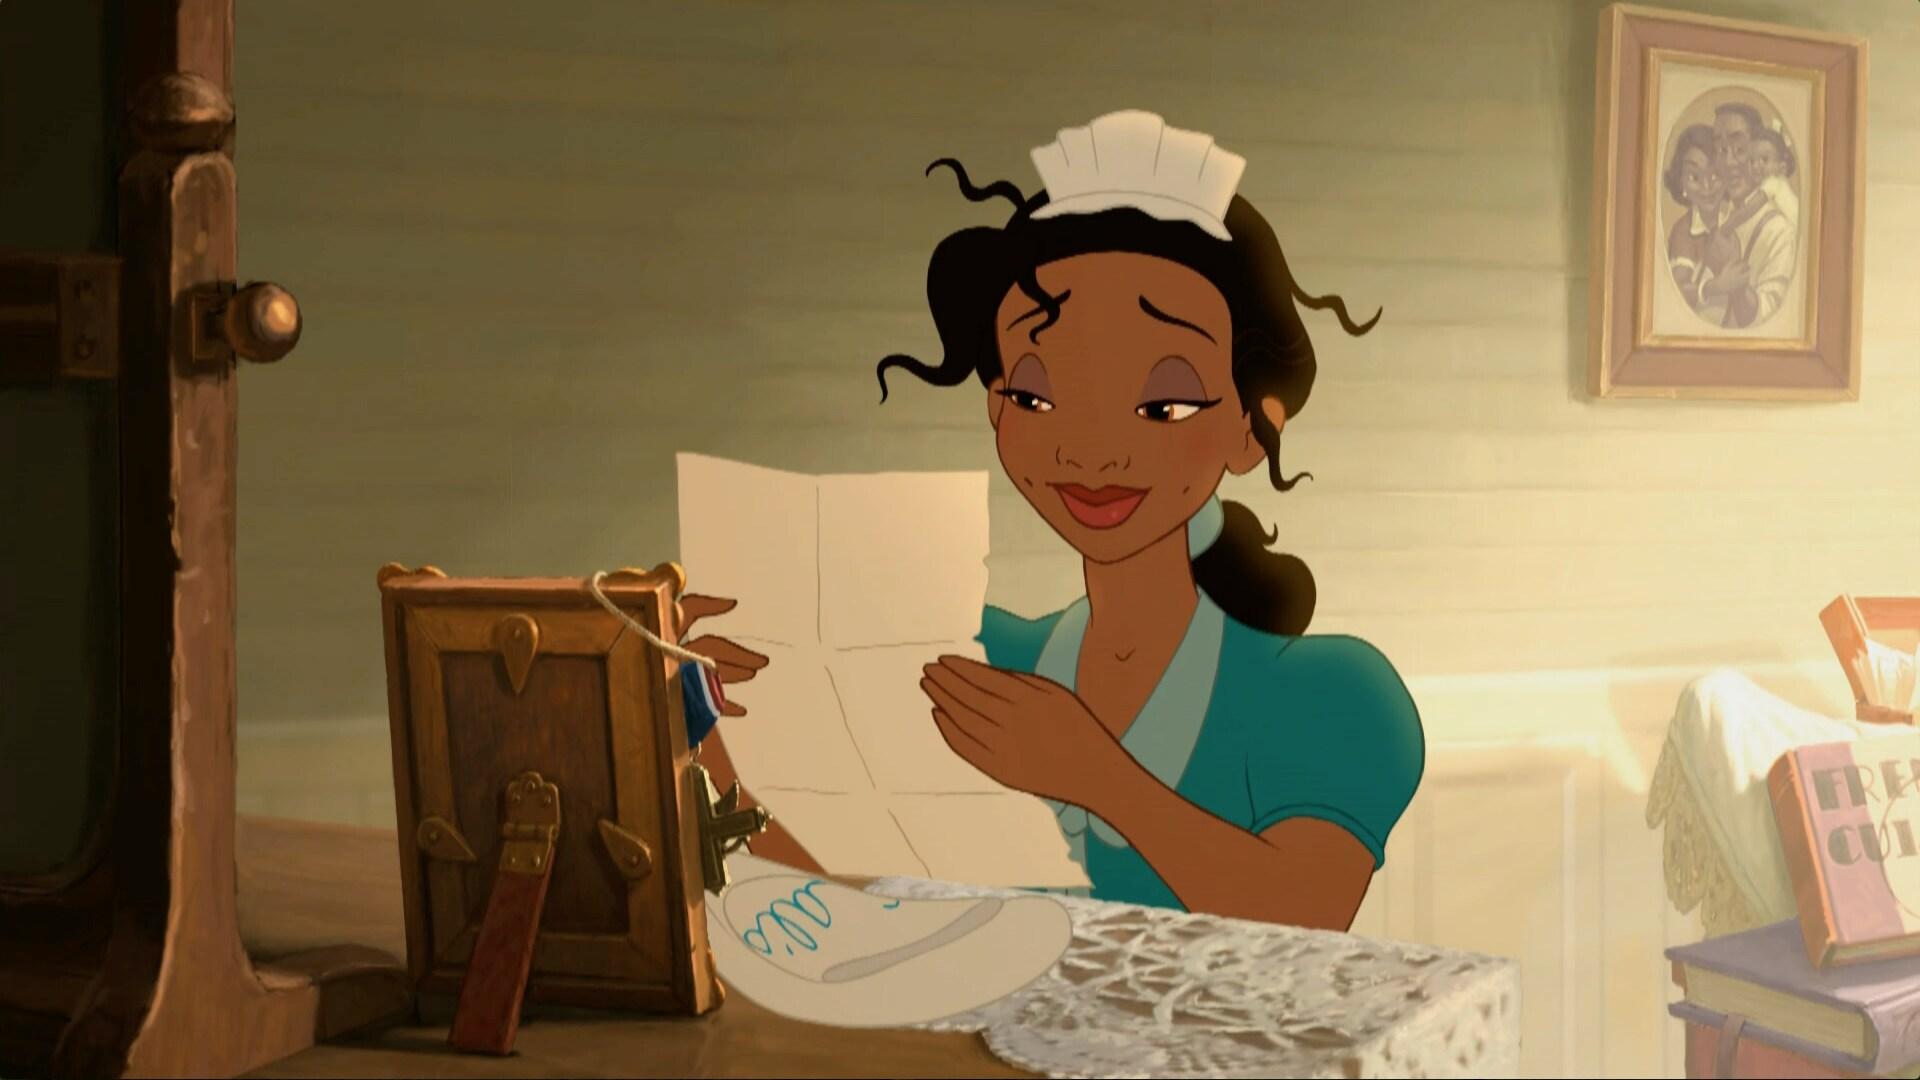 Soñando como Tiana - Soy princesa siendo yo